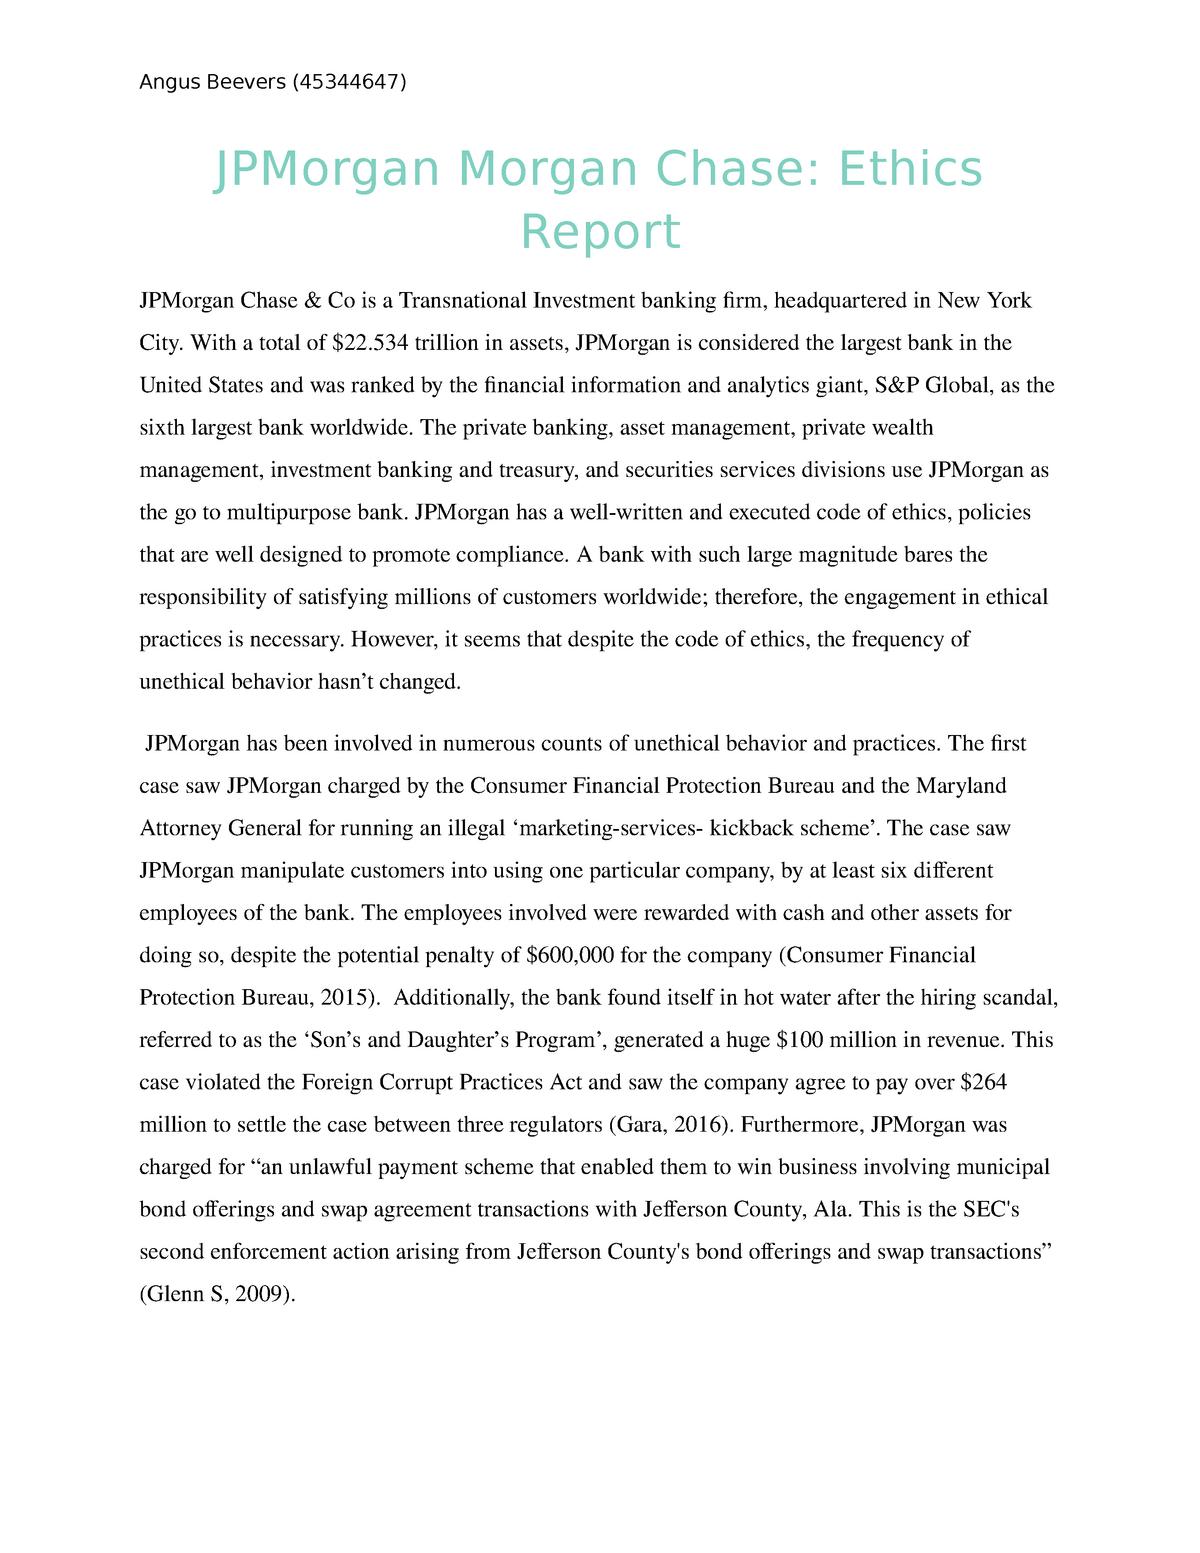 JPMorgan Morgan Chase Ethics Case Study - ACCG100: Accounting IA